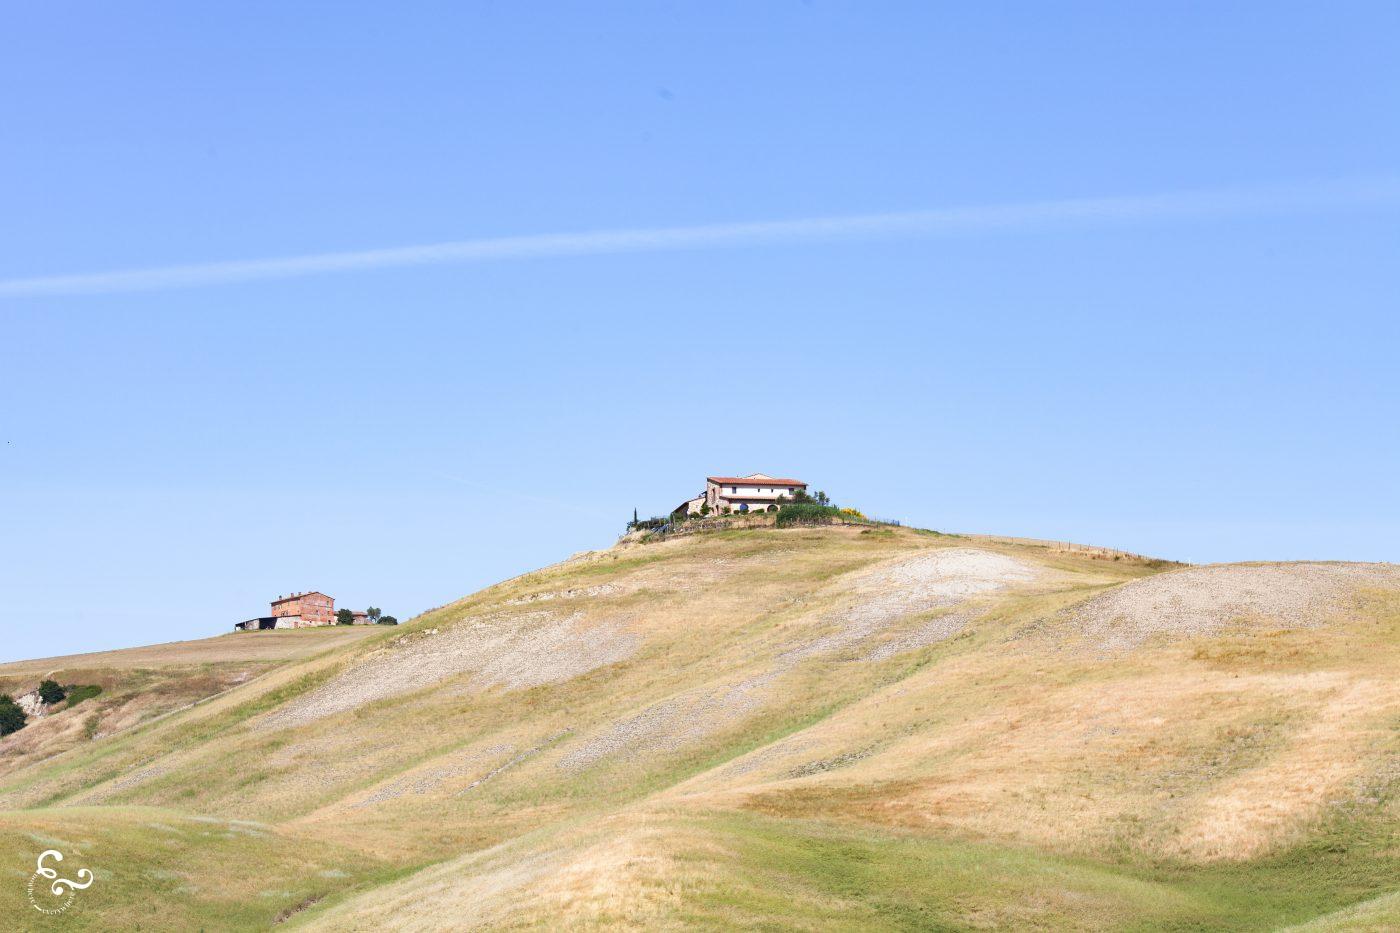 Crete Senesi & Chiusure, Siena, Tuscany Nowhere & Everywhere Lis Dingjan Free Range Pixels Travel PhotographyCrete Senesi & Chiusure, Siena